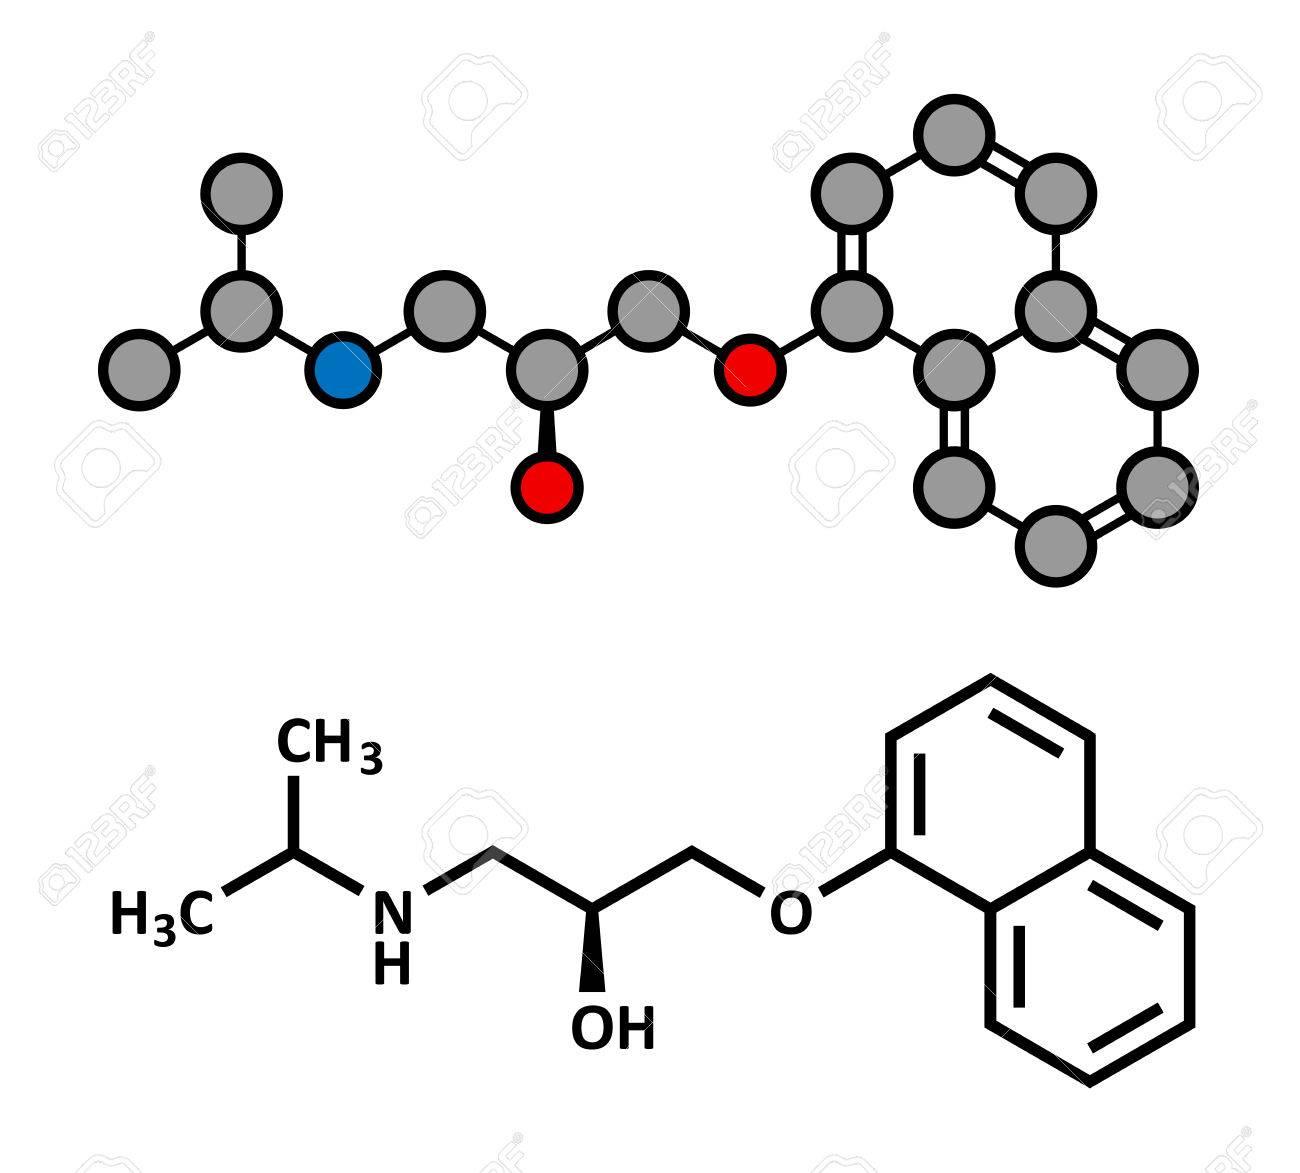 Colour therapy for high bp - Colour Therapy For High Blood Pressure Propanolol High Blood Pressure Drug Molecule Used To Treat